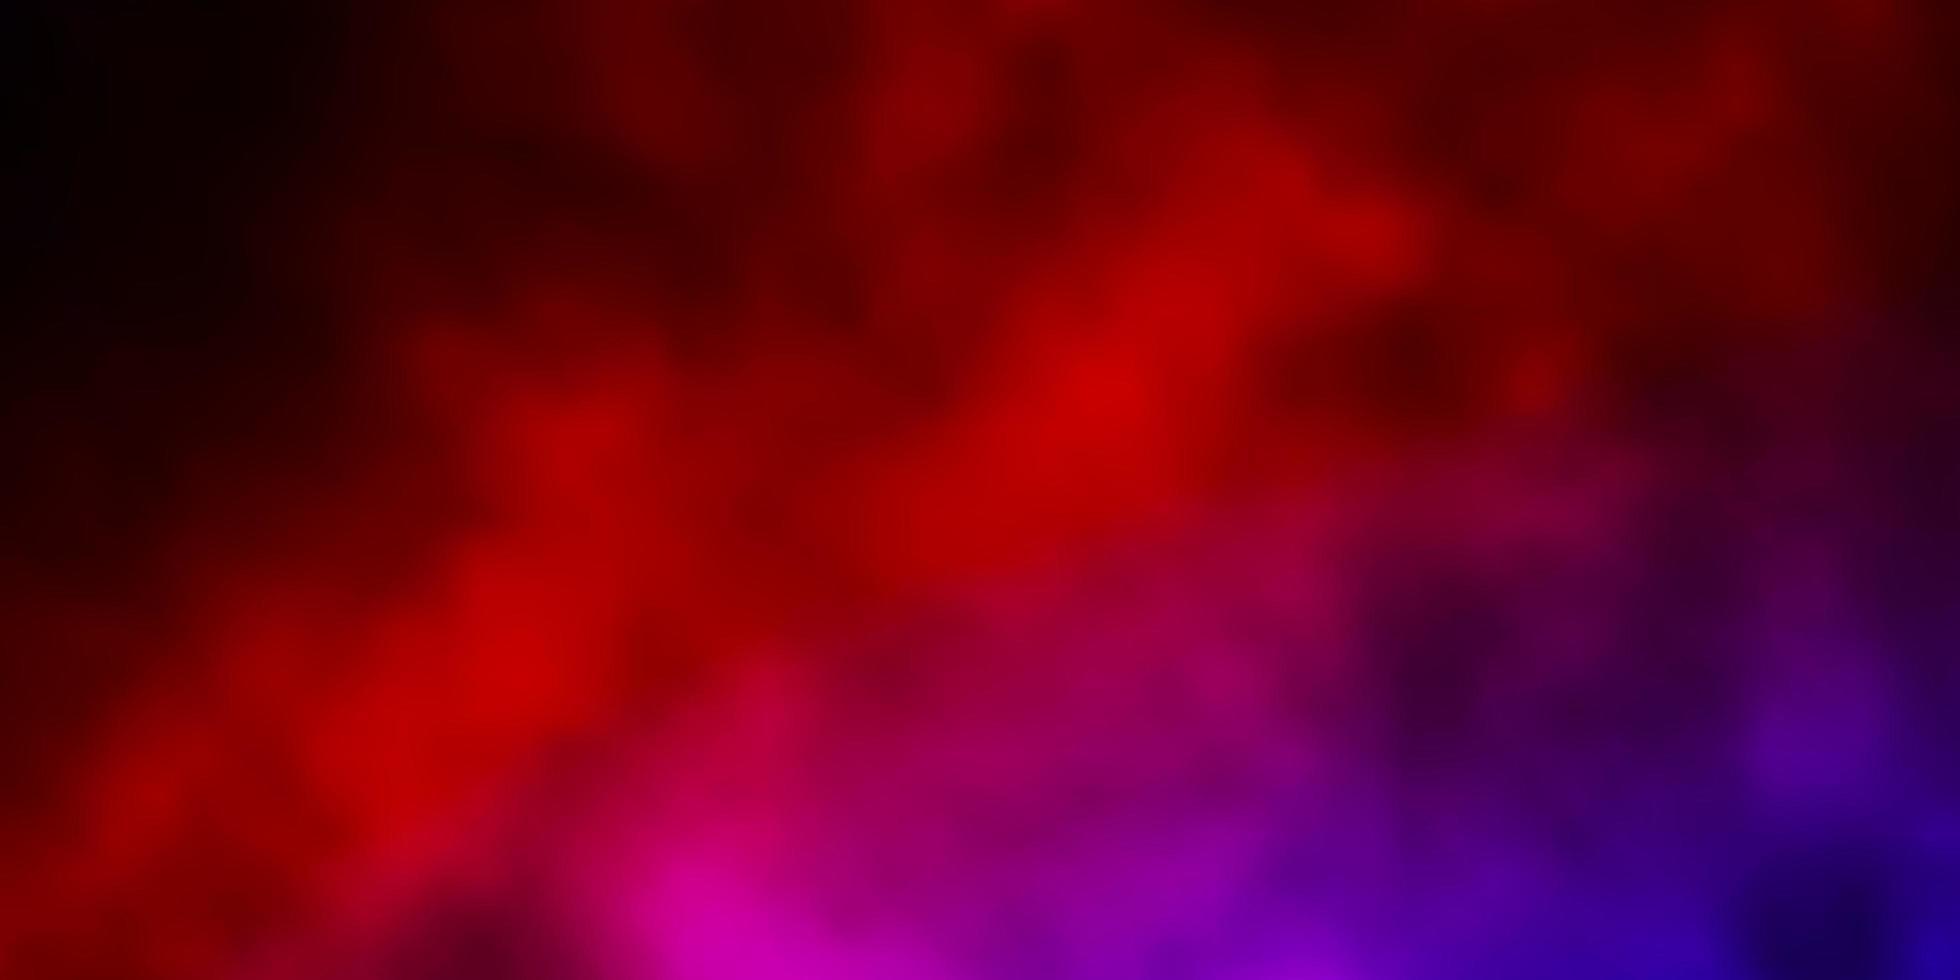 textura de vector azul oscuro, rojo con cielo nublado.